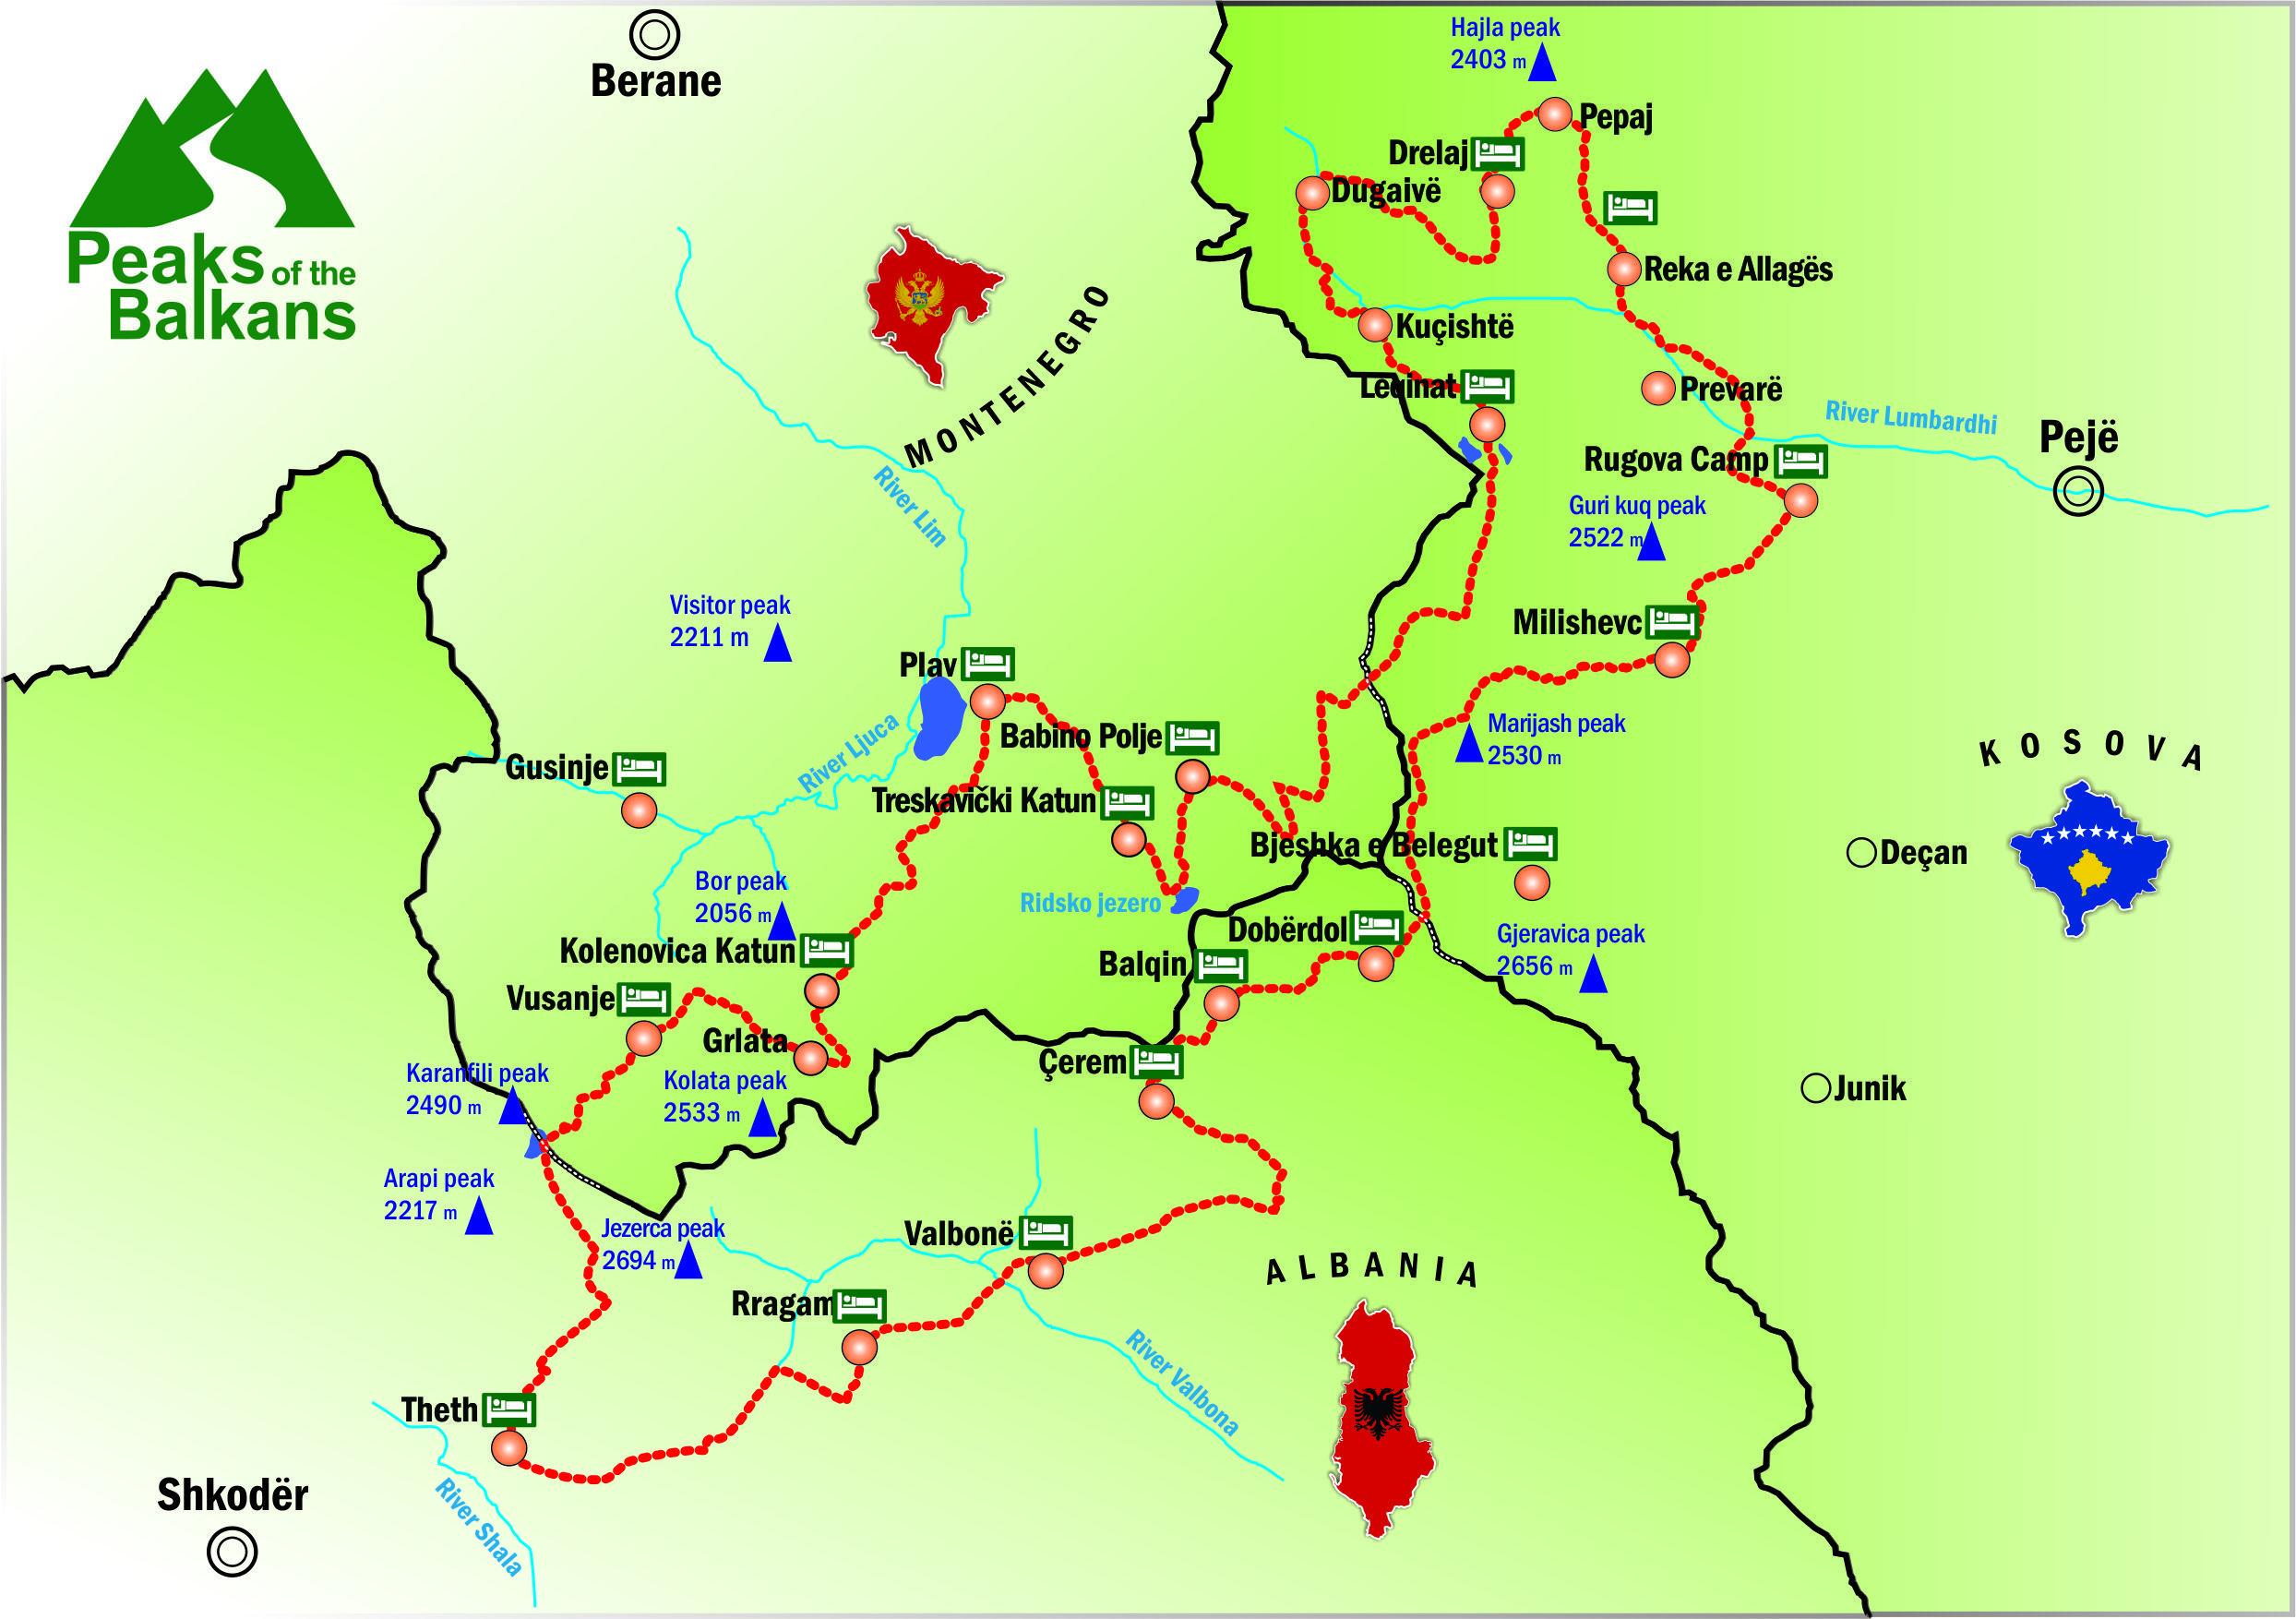 Peaks of the Balkans Map - Carte